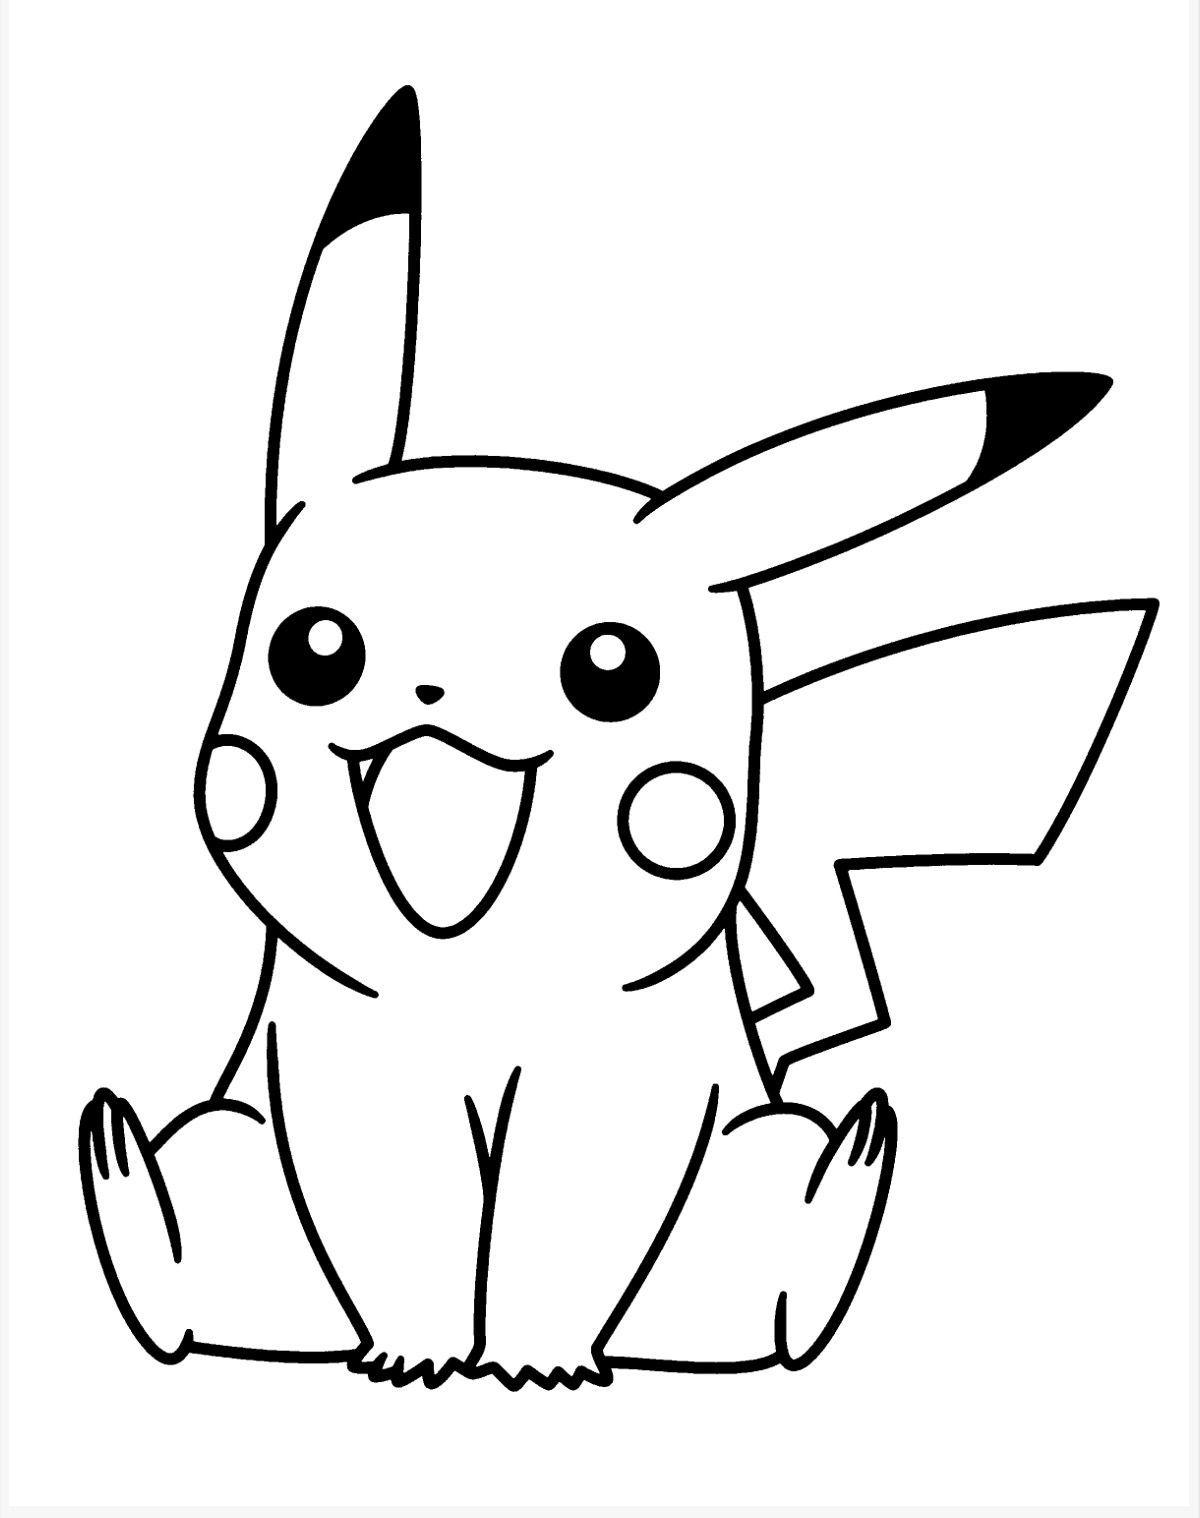 ausmalbilder pokemon evoli httpskinderausmalbilderco